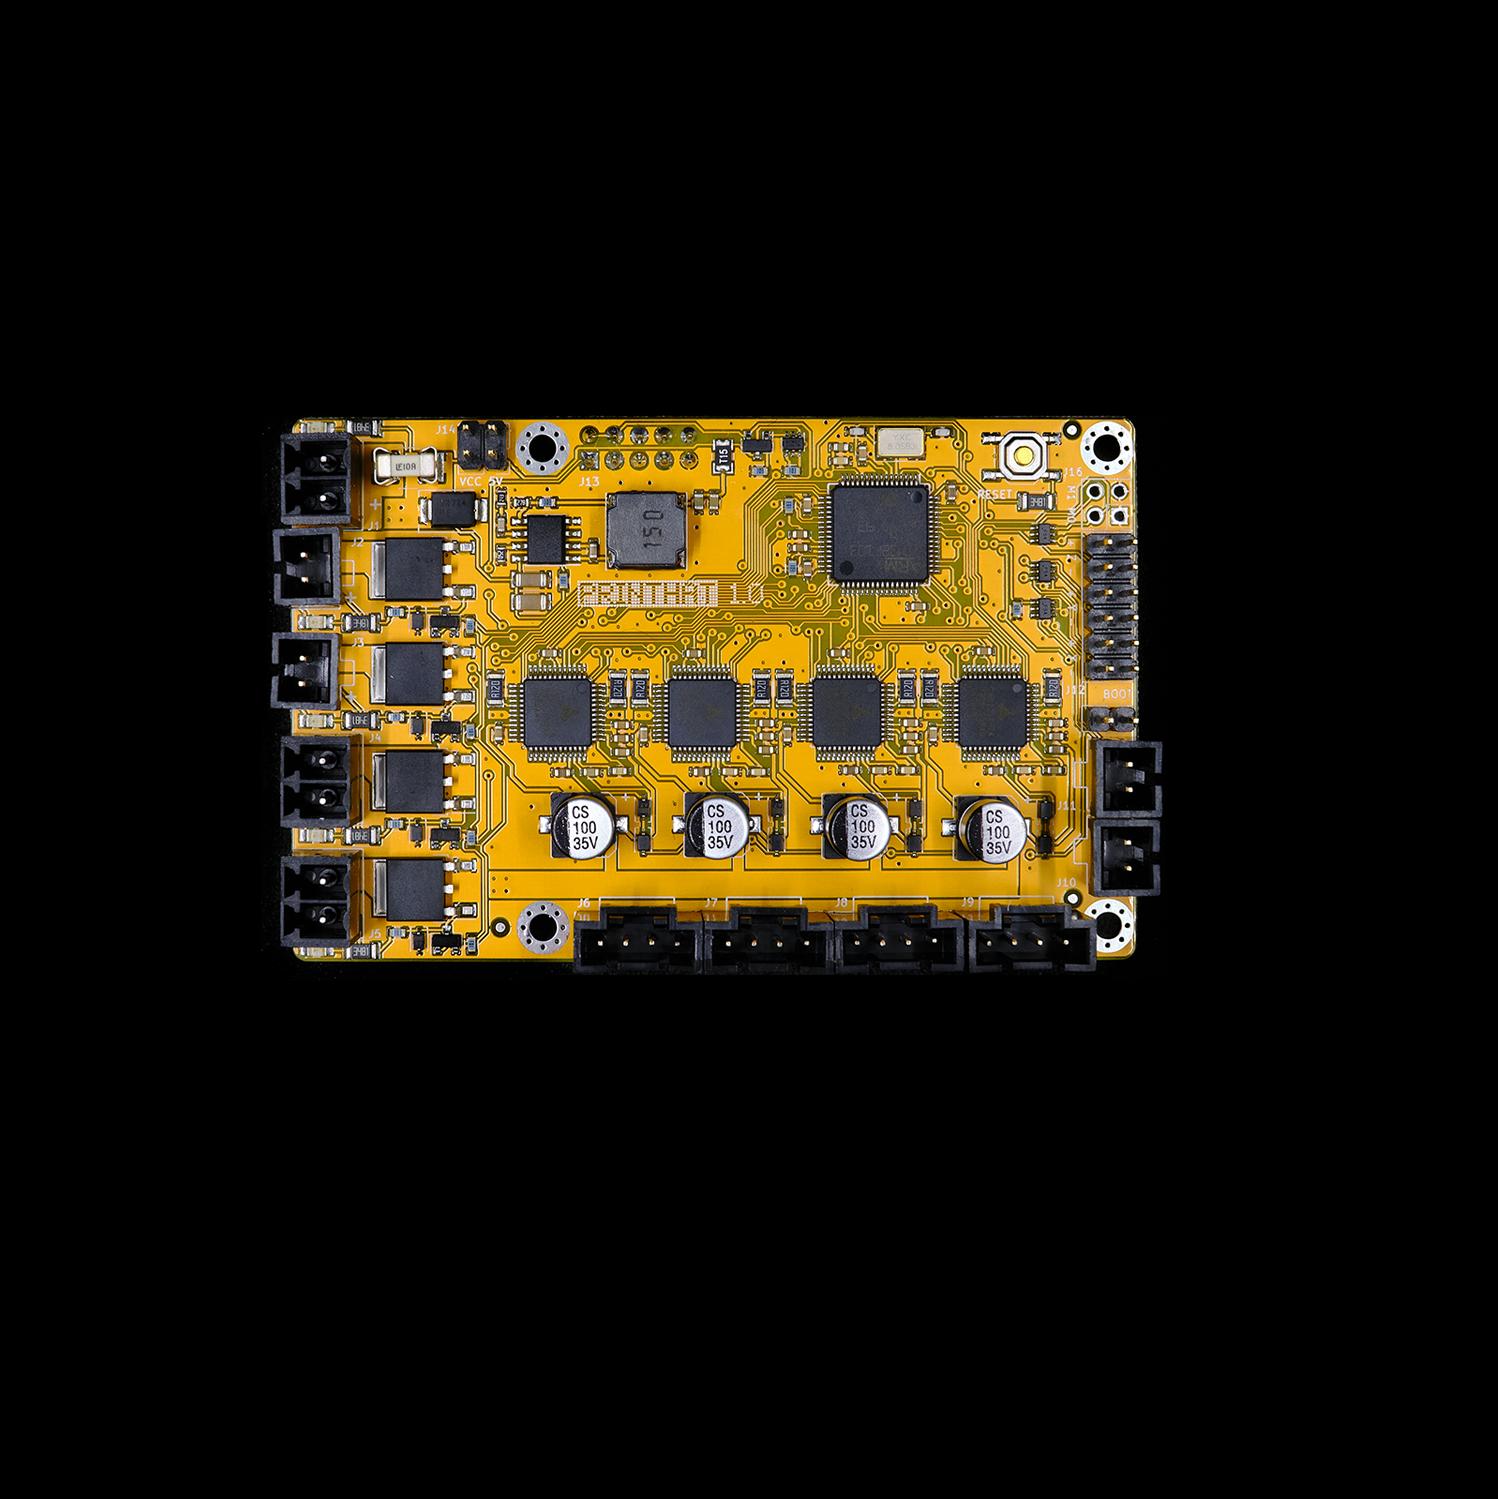 PrintHat v1 - 32-bit motor controller board for Raspberry Pi